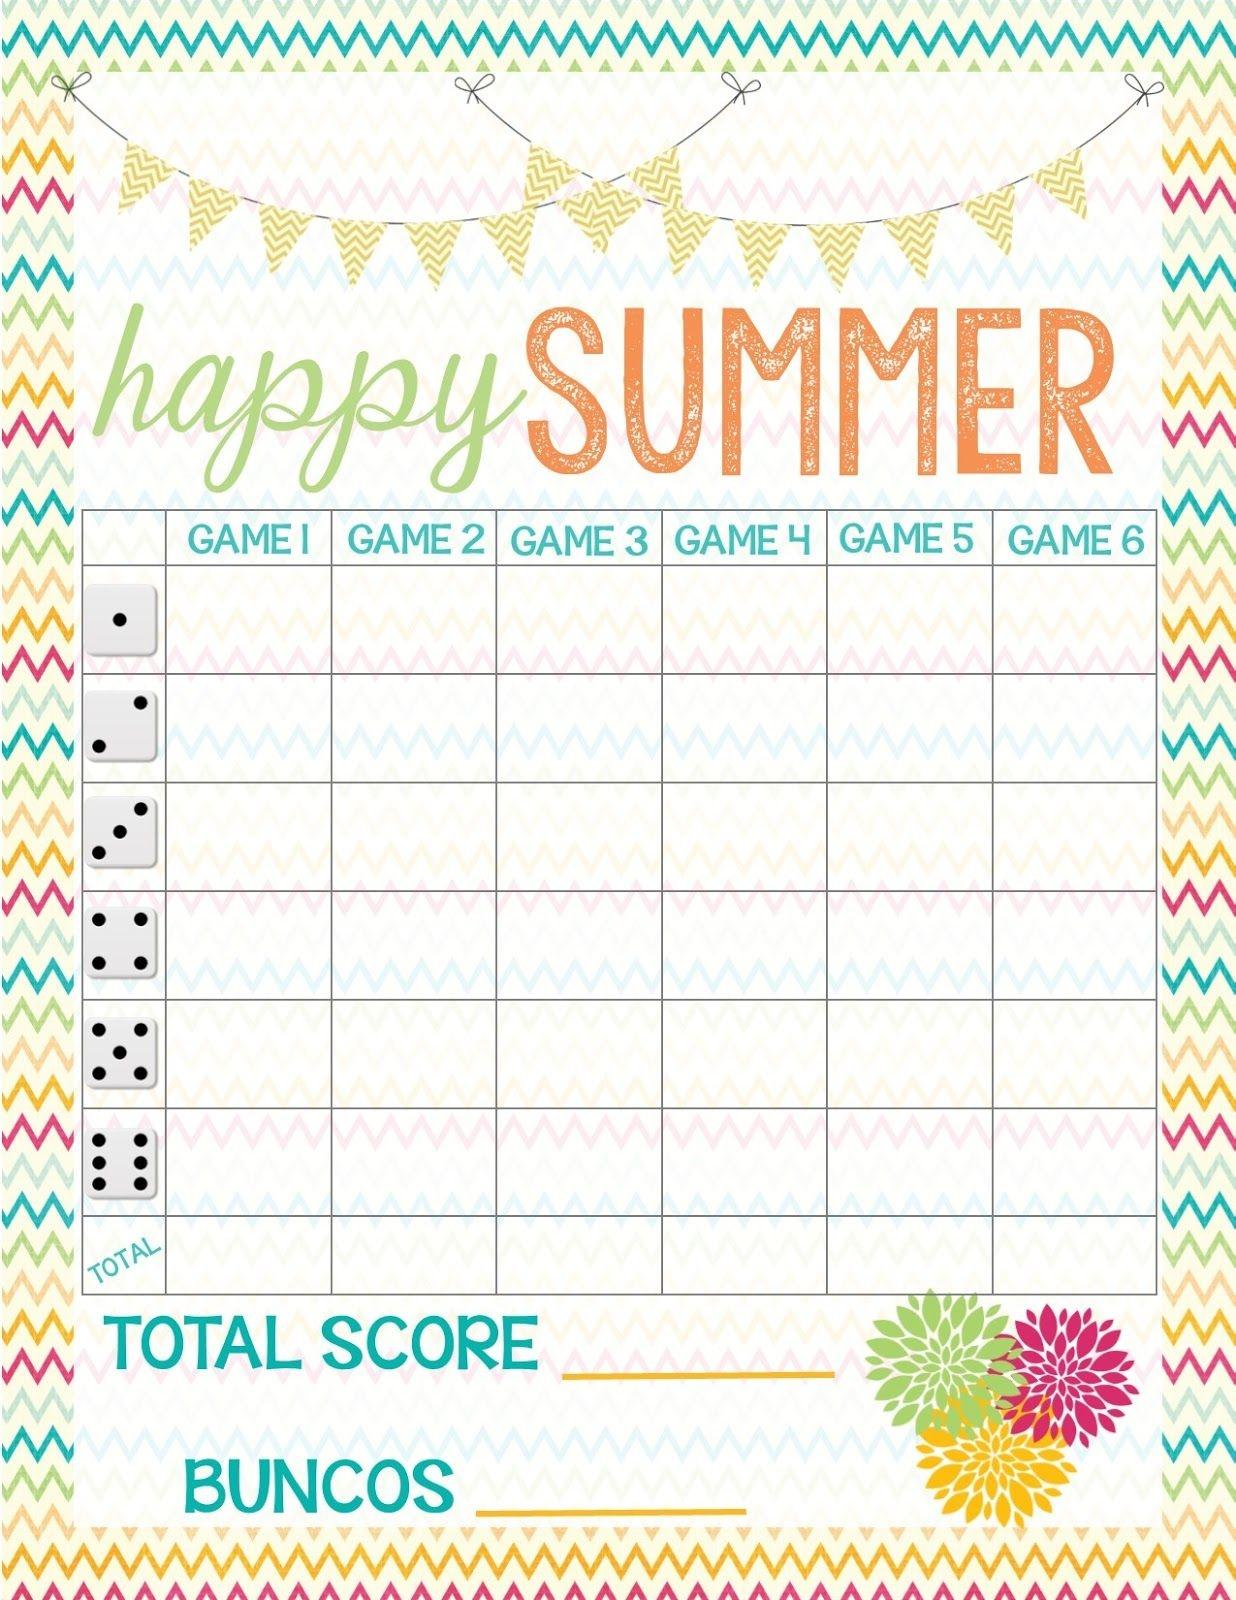 Recipes From Stephanie: Free Bunco Score Sheet | Bunco In 2019 - Free Printable Bunco Score Sheets